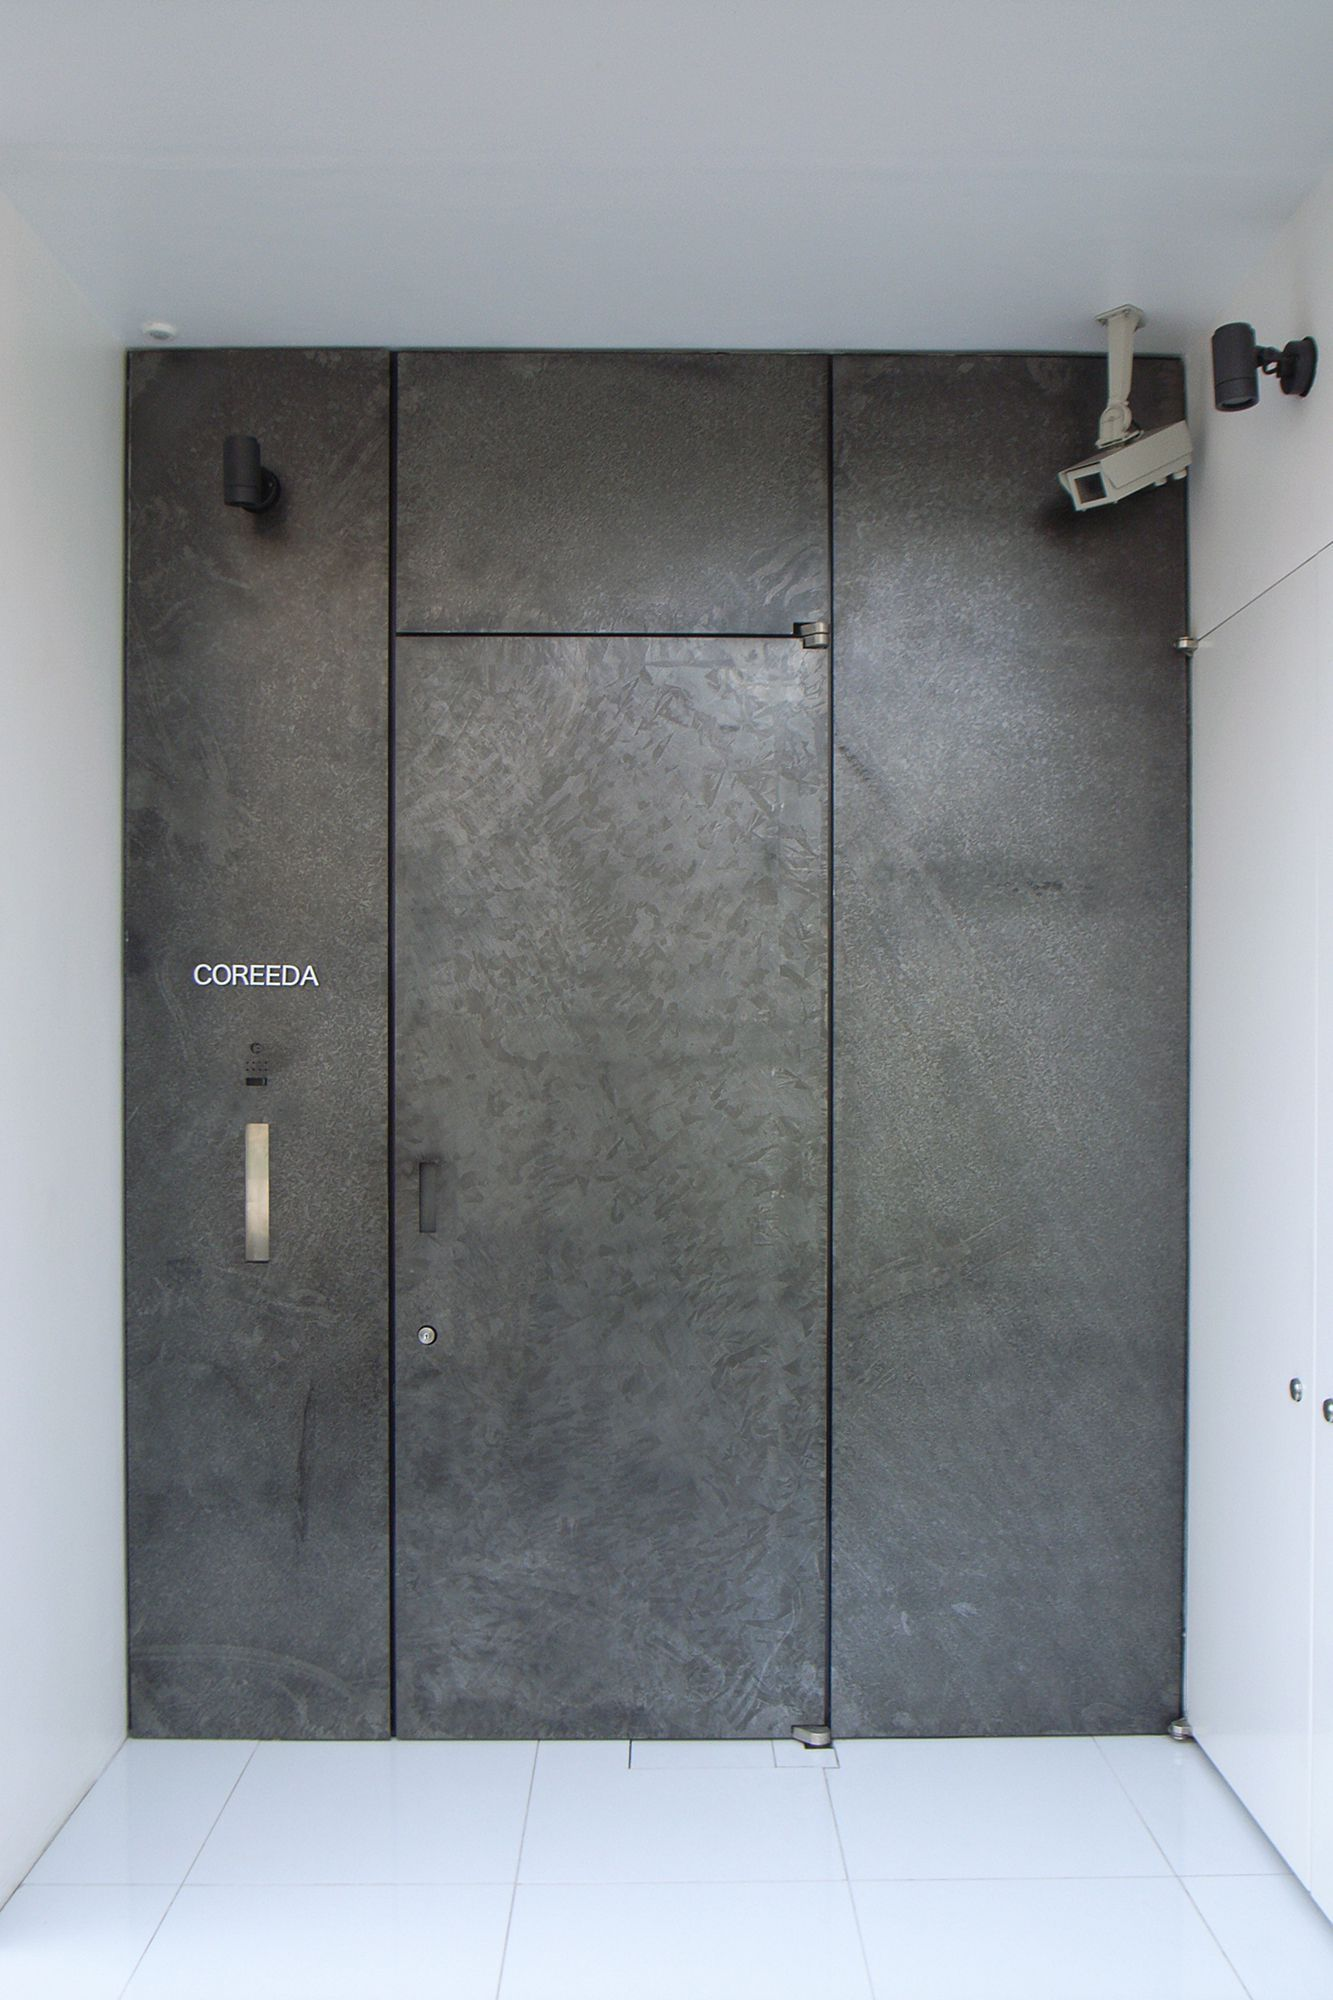 003_Entrance_1